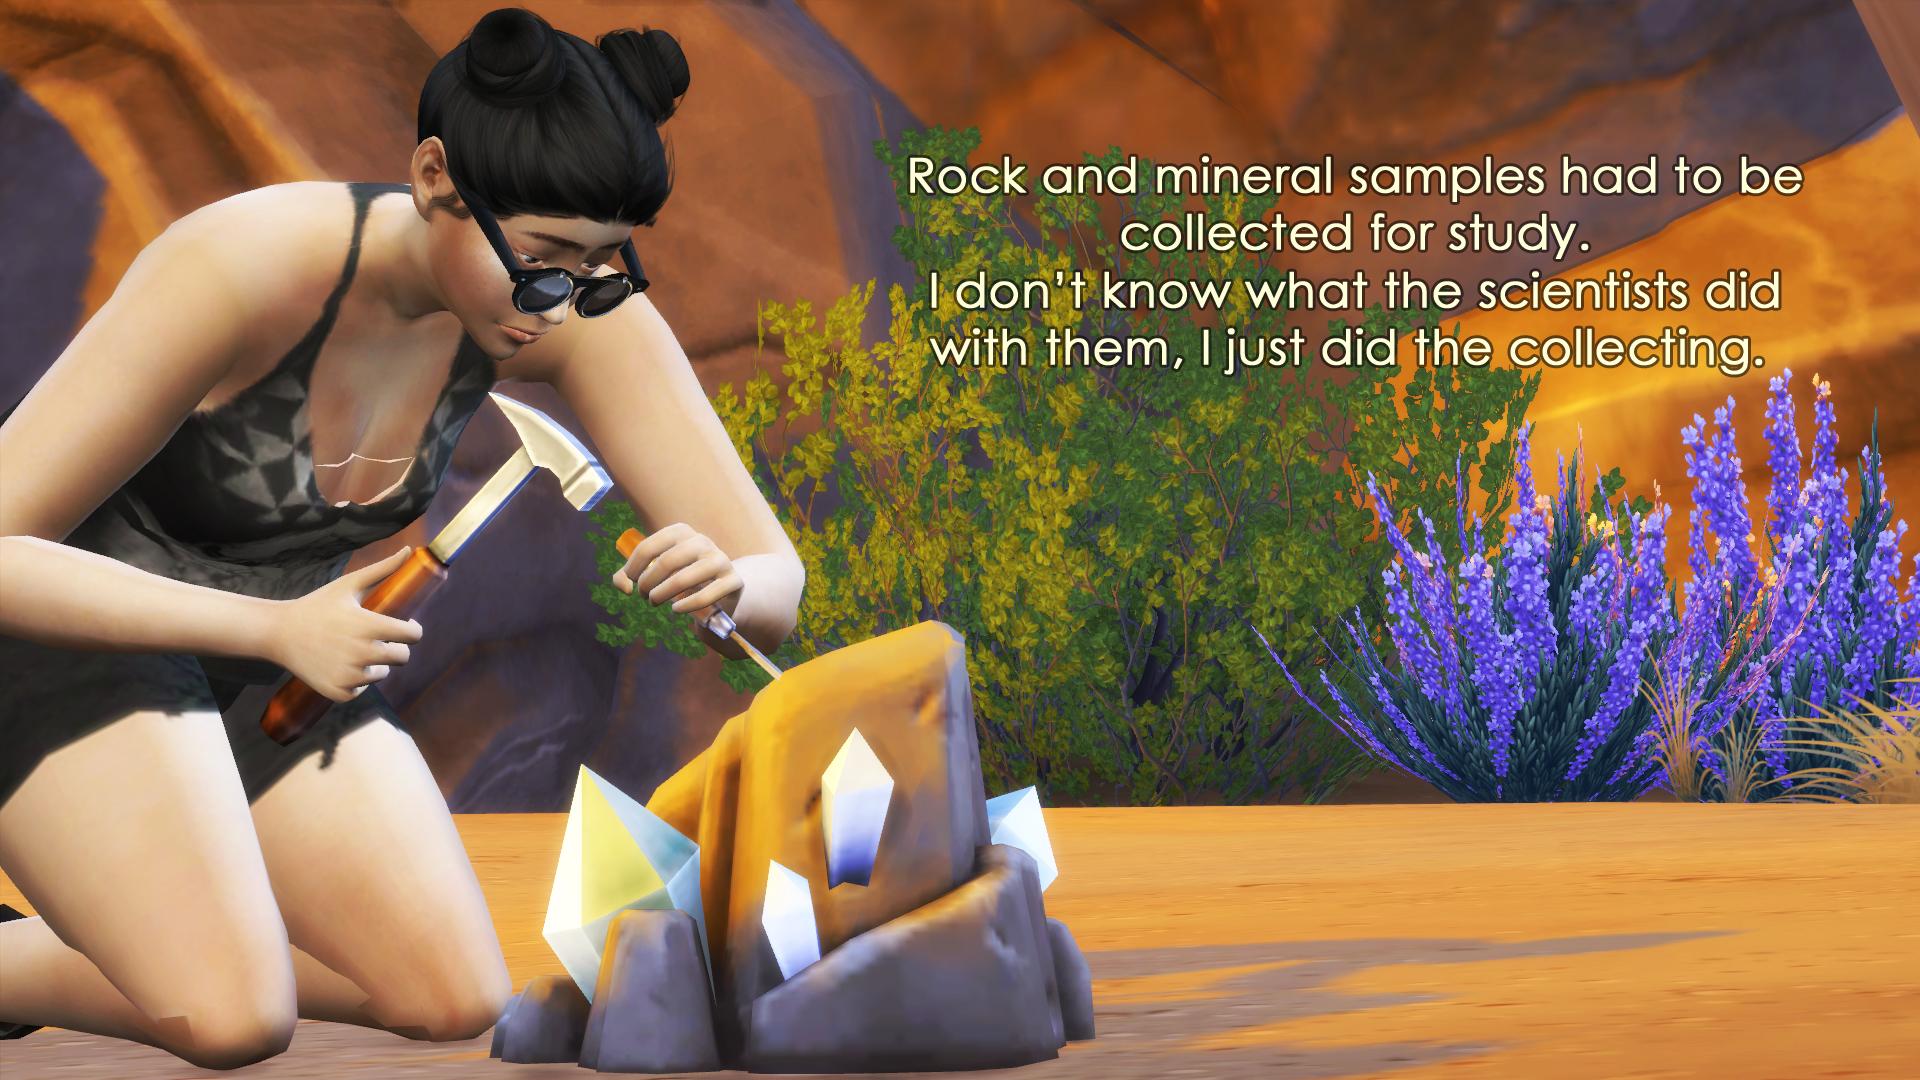 14 mineral samples